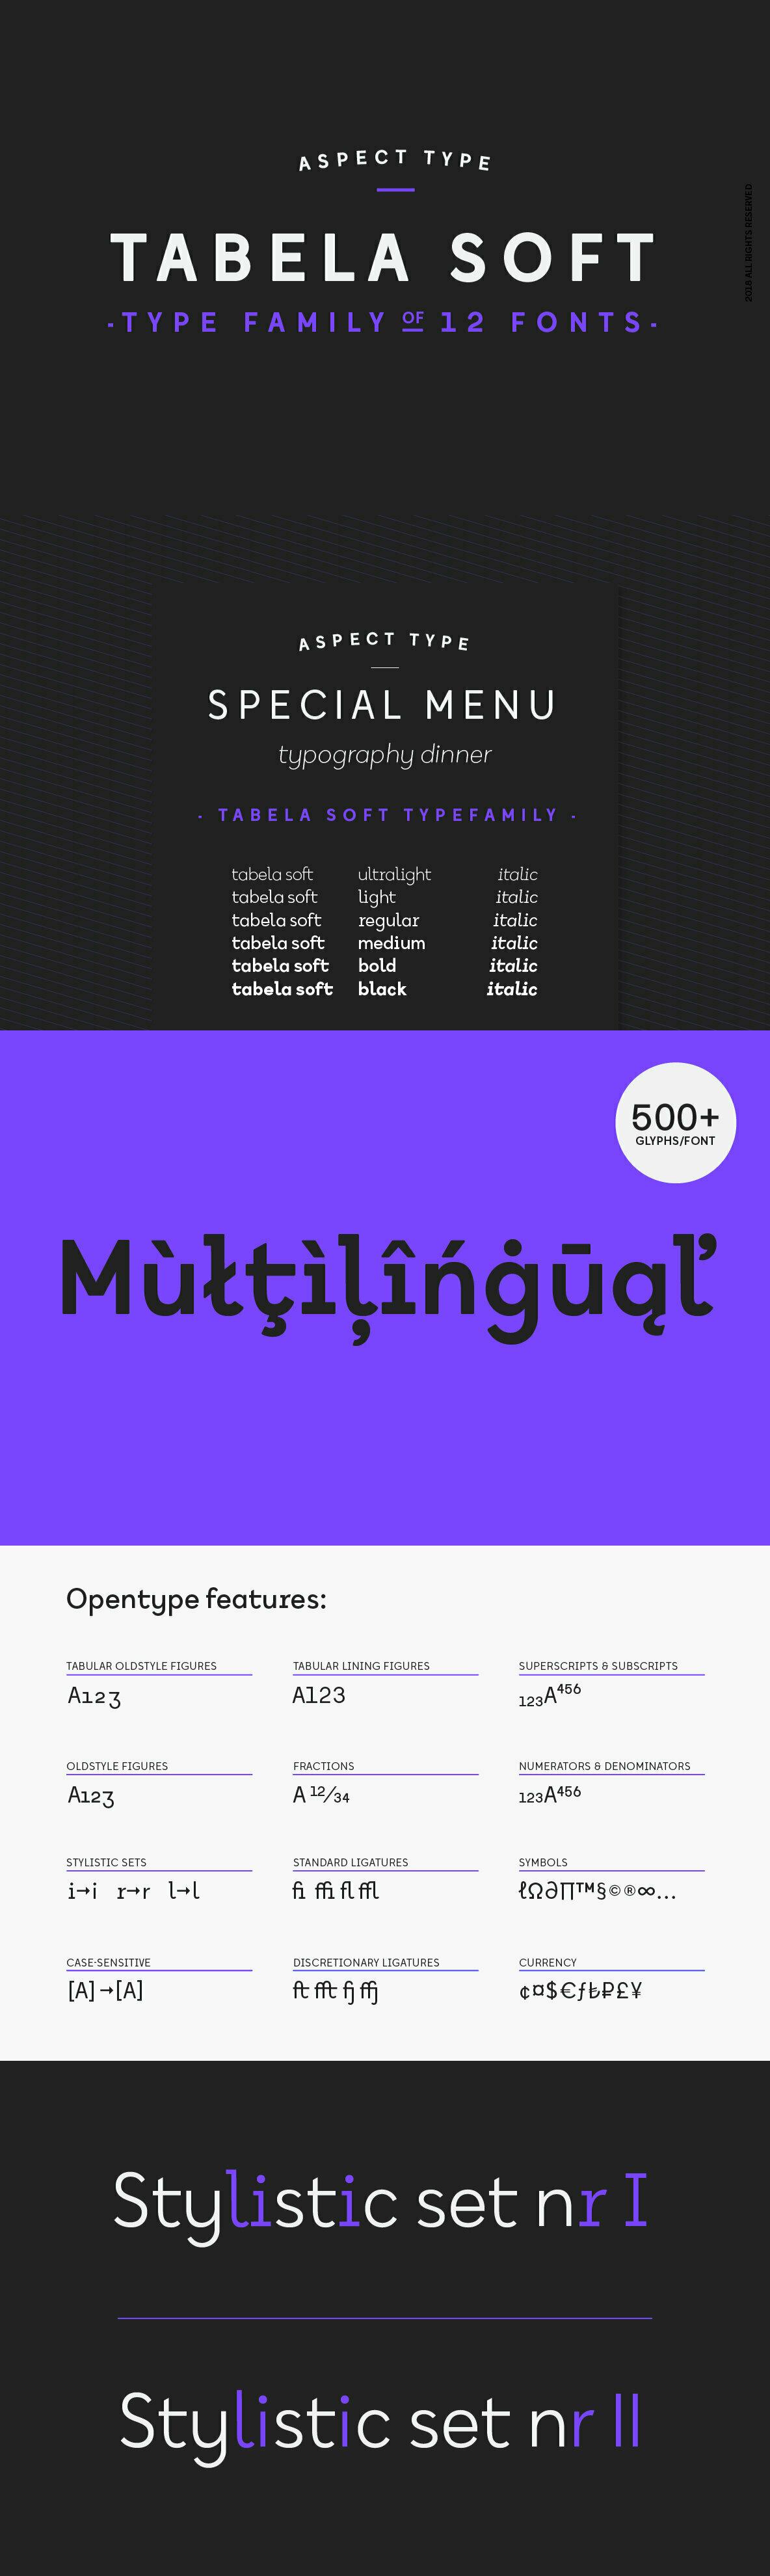 Tabela Soft | Sans-Serif Fonts | Fonts, Sans serif fonts